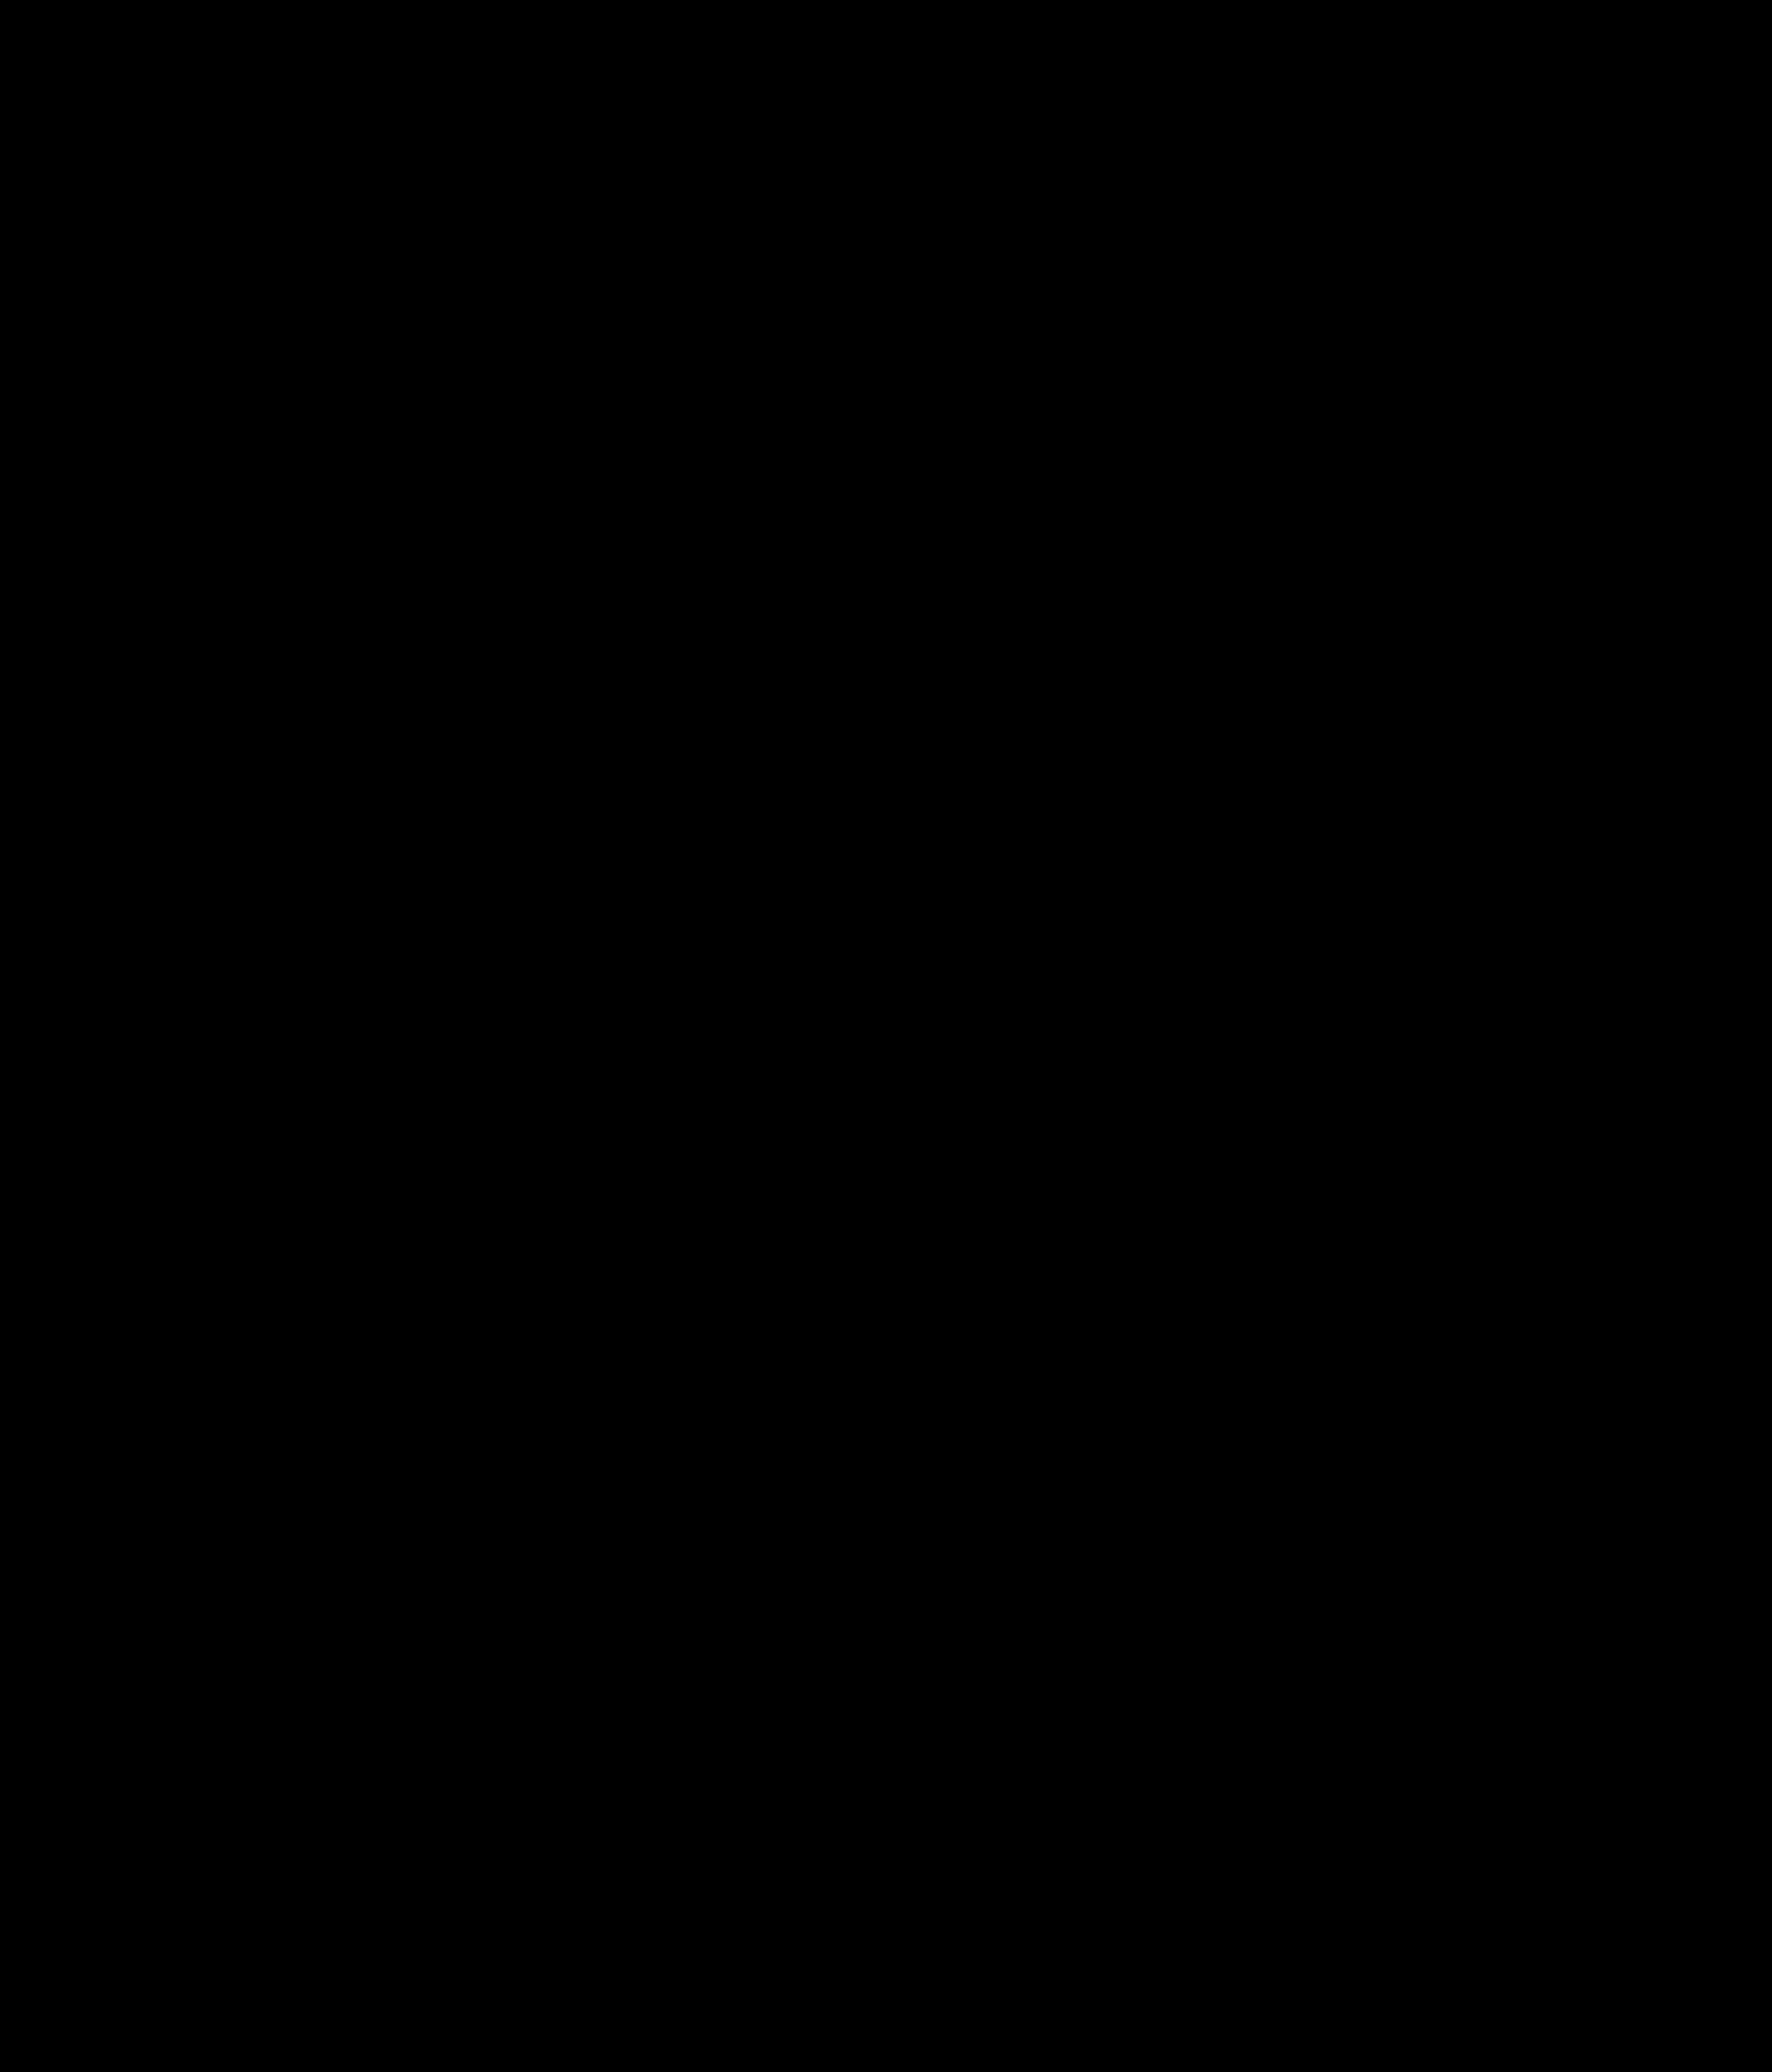 Oval border png. Unique clipart images vector